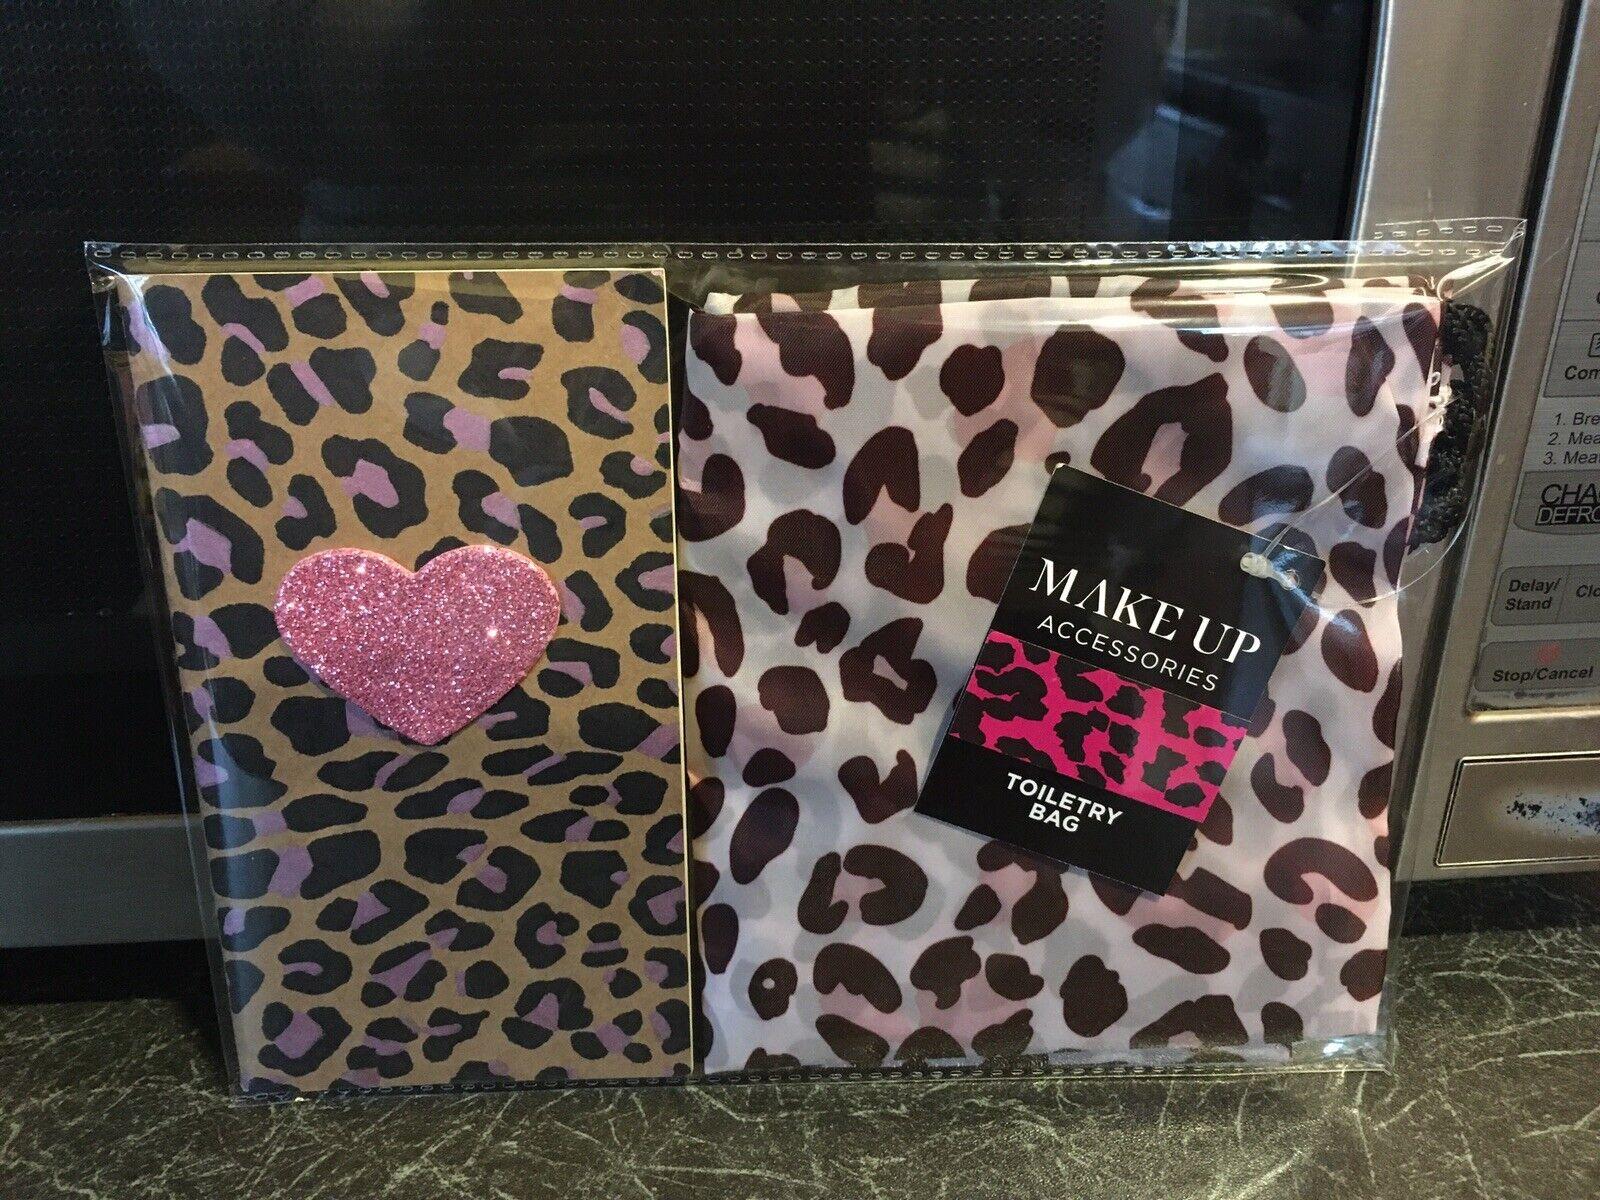 Retro Rockabilly Pink Leopard Print Toiletry Bag +Heart Notebook 2pc Gift Set